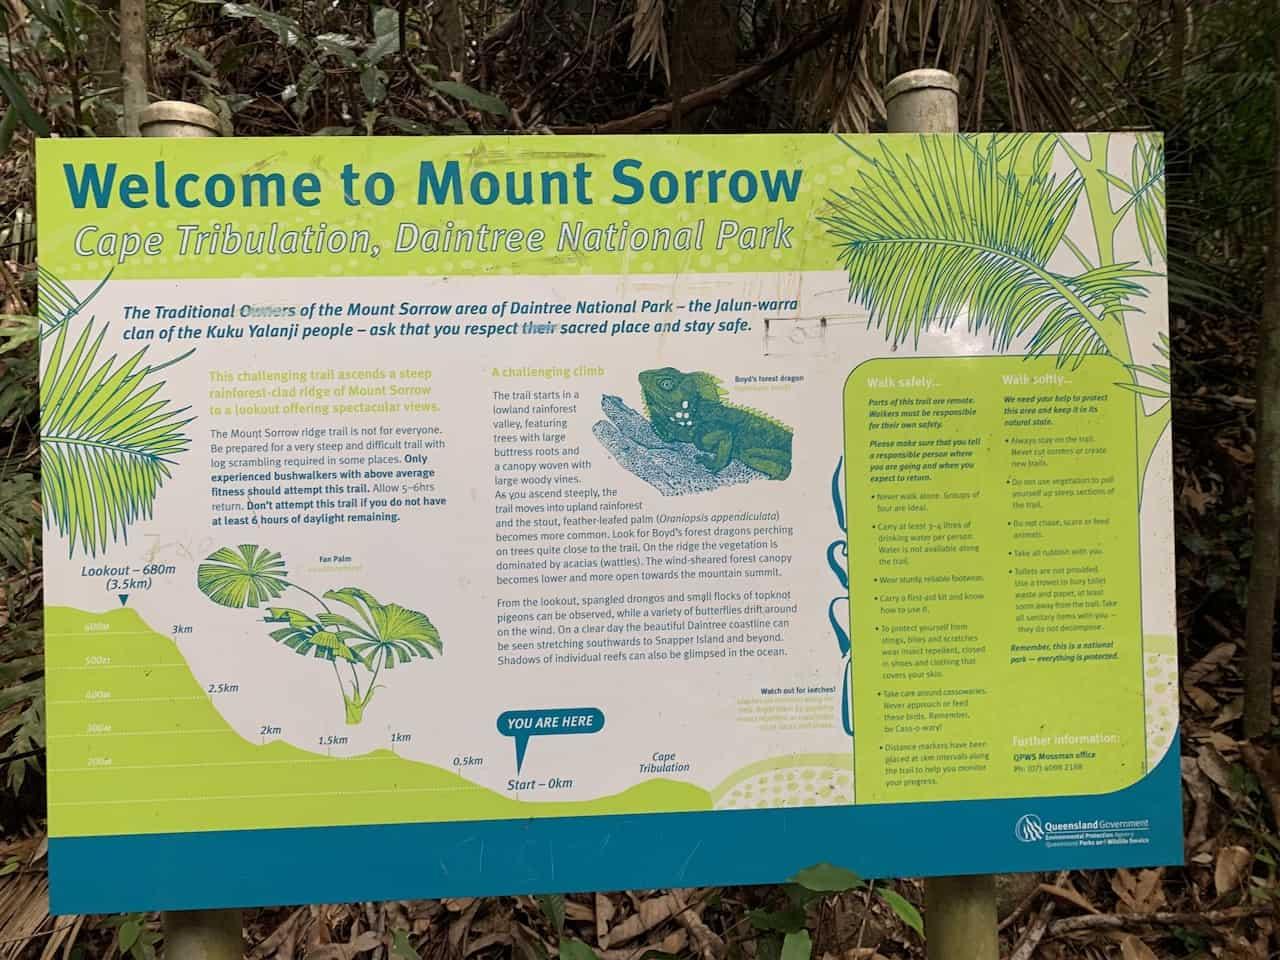 Mount Sorrow Daintree National Park